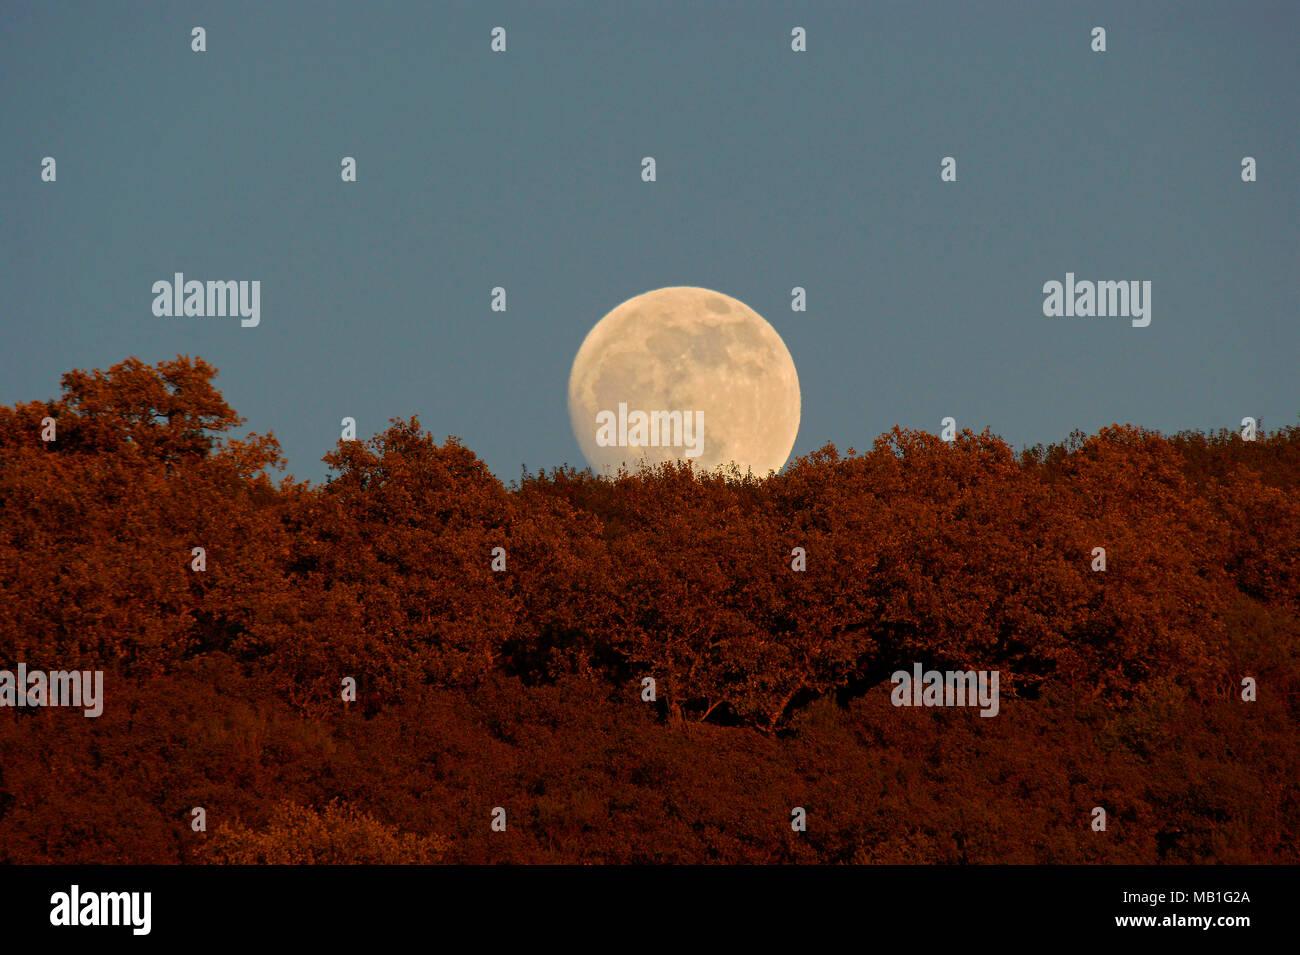 At the same time, sunset and moonrise in Andújar Natural Park y Sierra Morena, Spain. - Stock Image